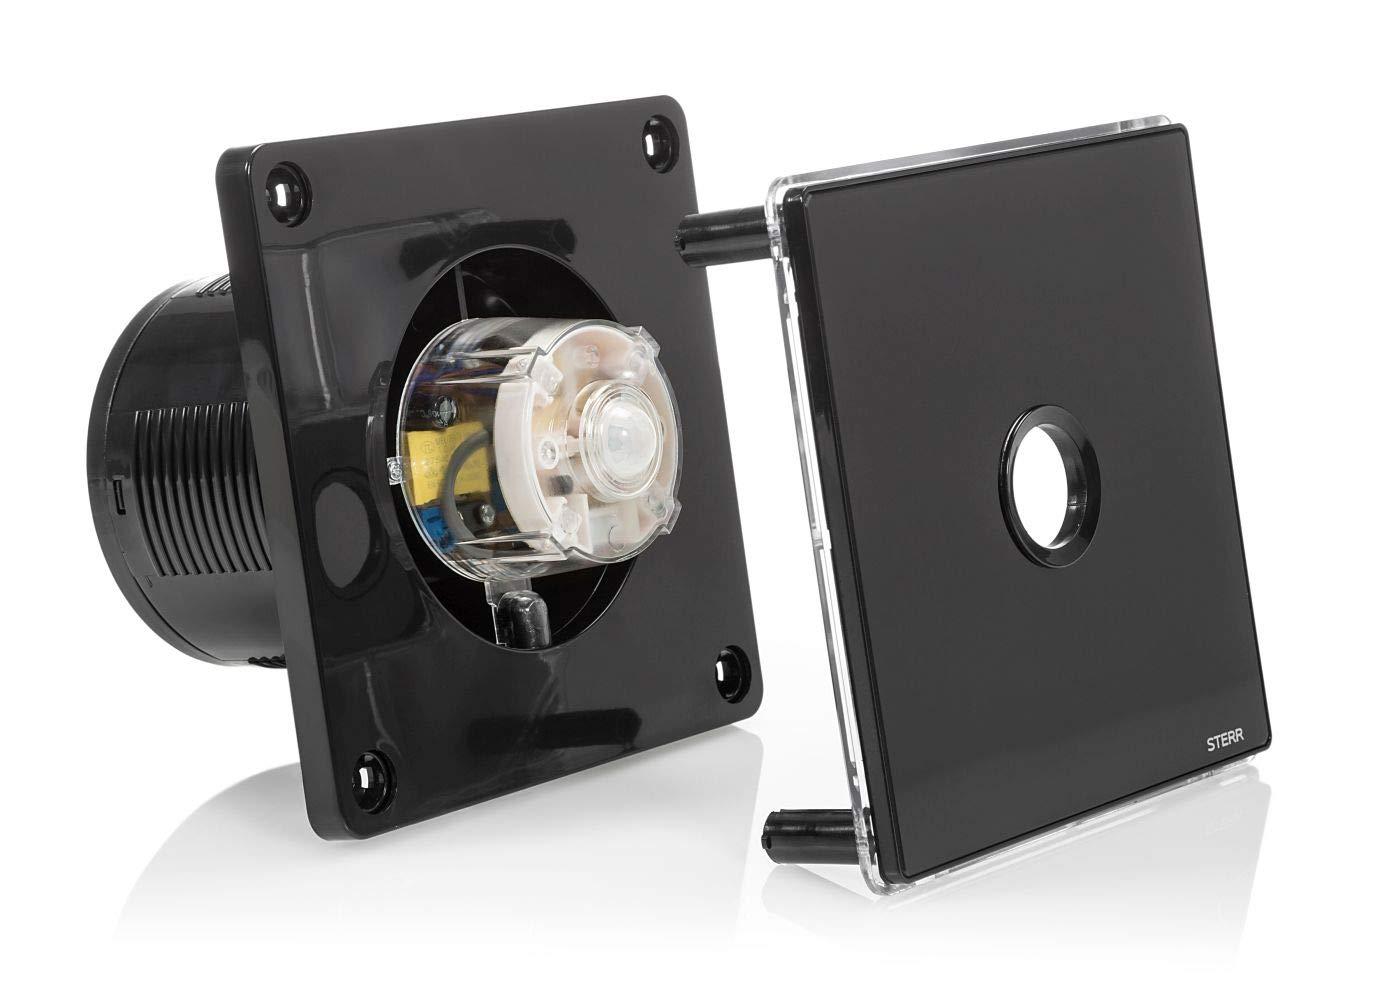 STERR Black Bathroom Extractor Fan with LED Backlight and PIR Sensor 100 mm BFS100LP-B 4